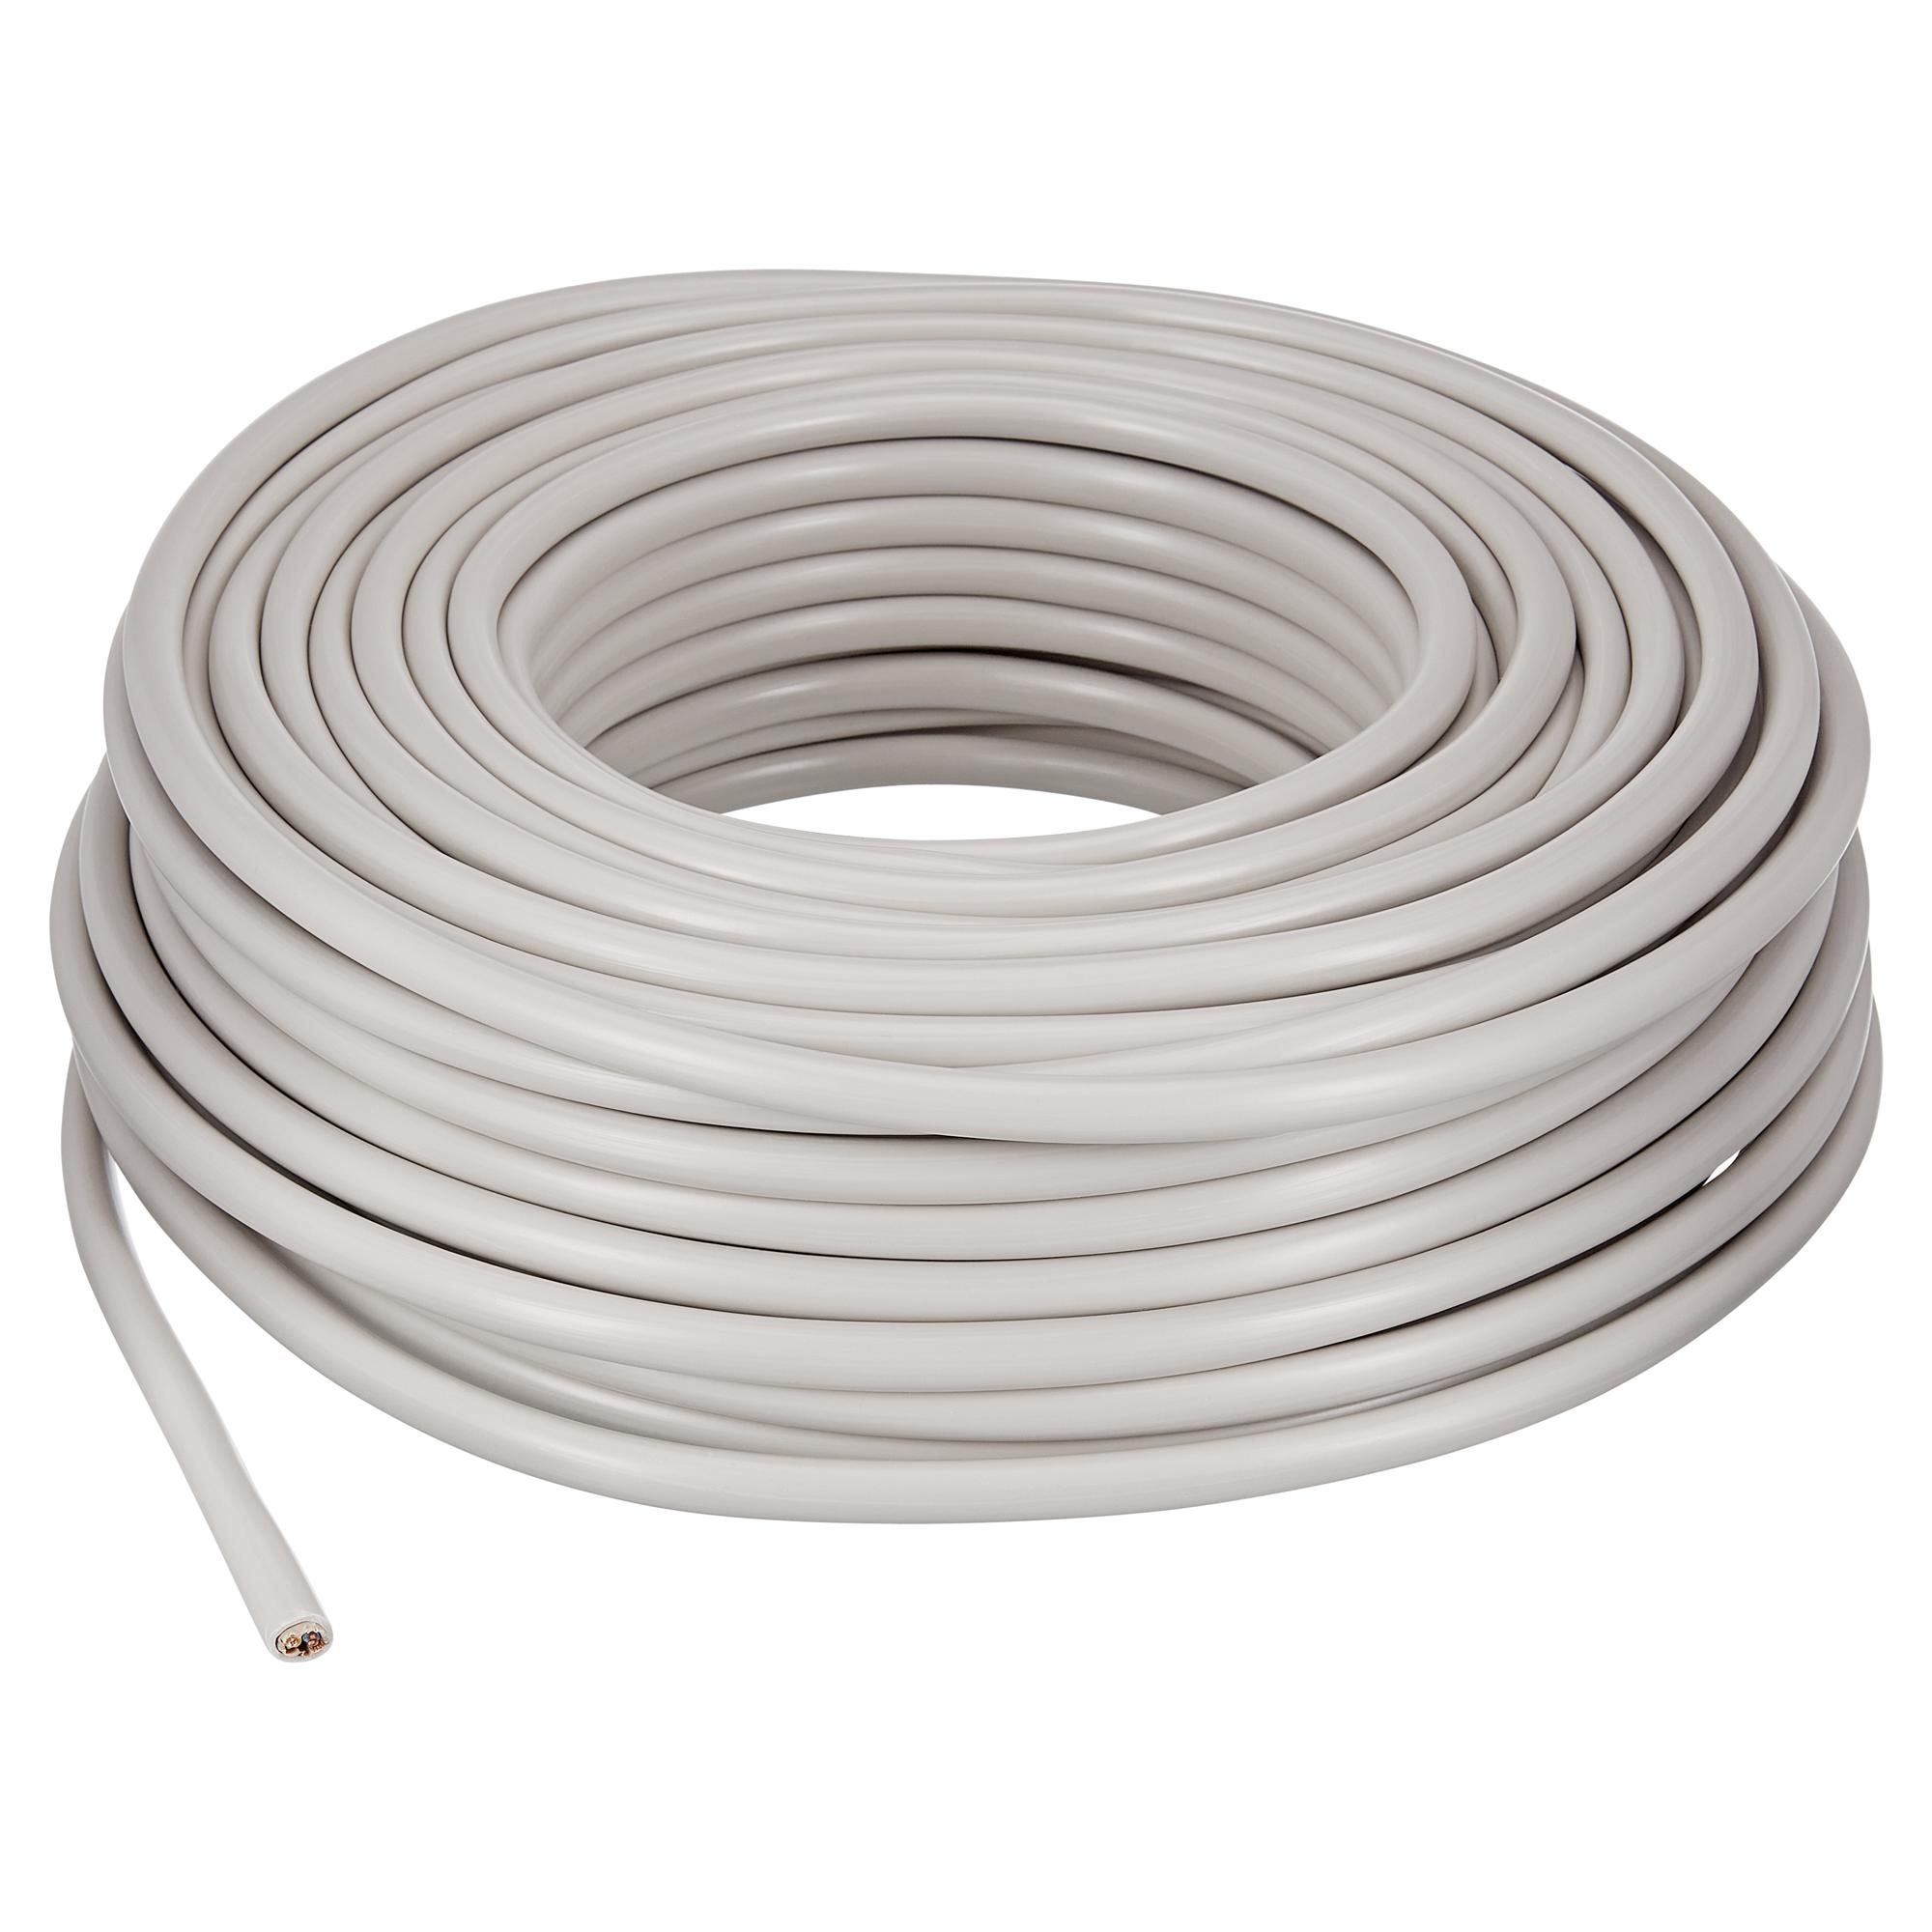 NYM-J feuchtraum-Manteau Tuyau électro-Installation Câble 100 m Ring 5x2 5 mmâ²